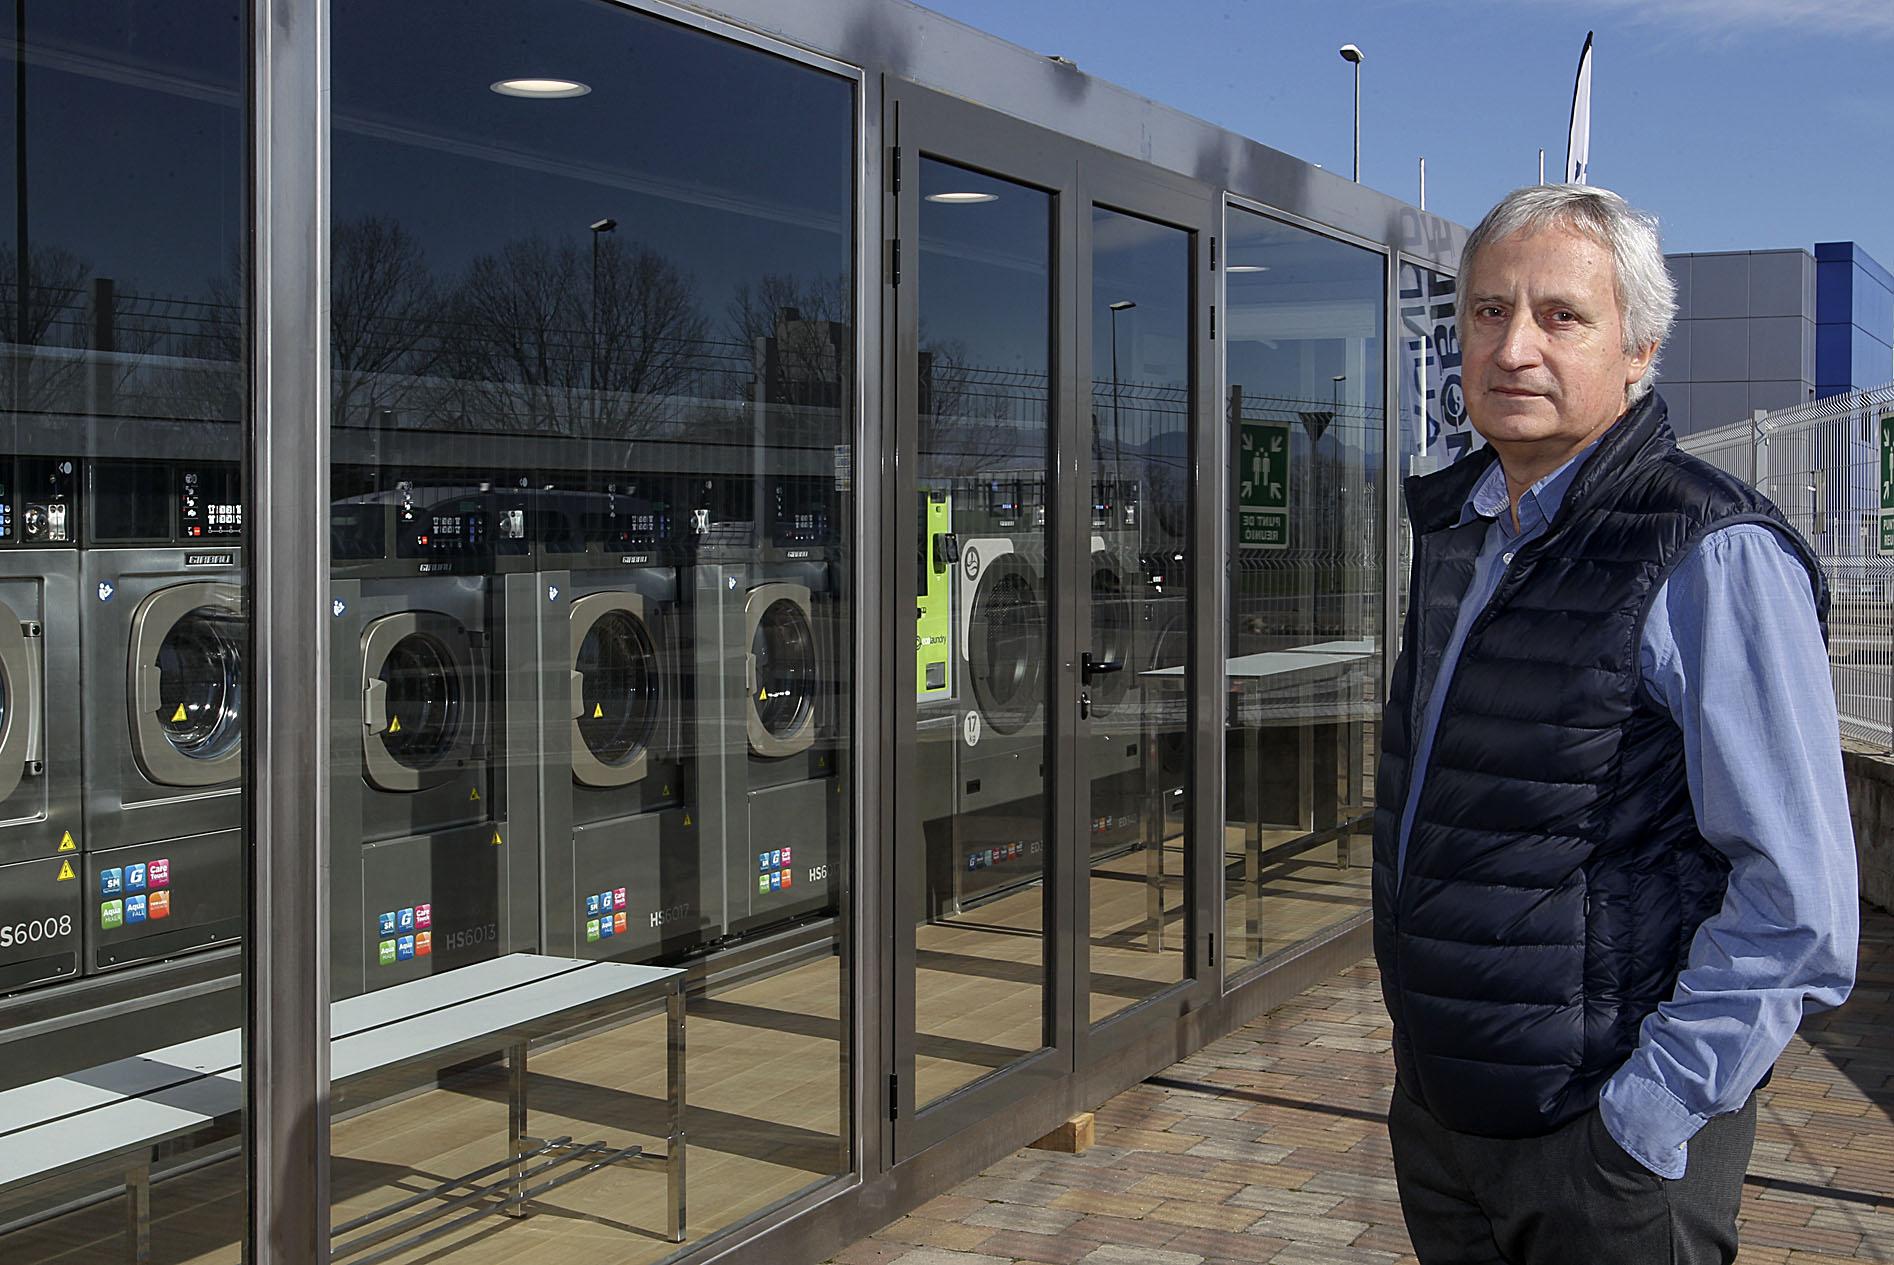 Jordi Aulí davant el prototip de la bugaderia mòbil fabricada per Girbau